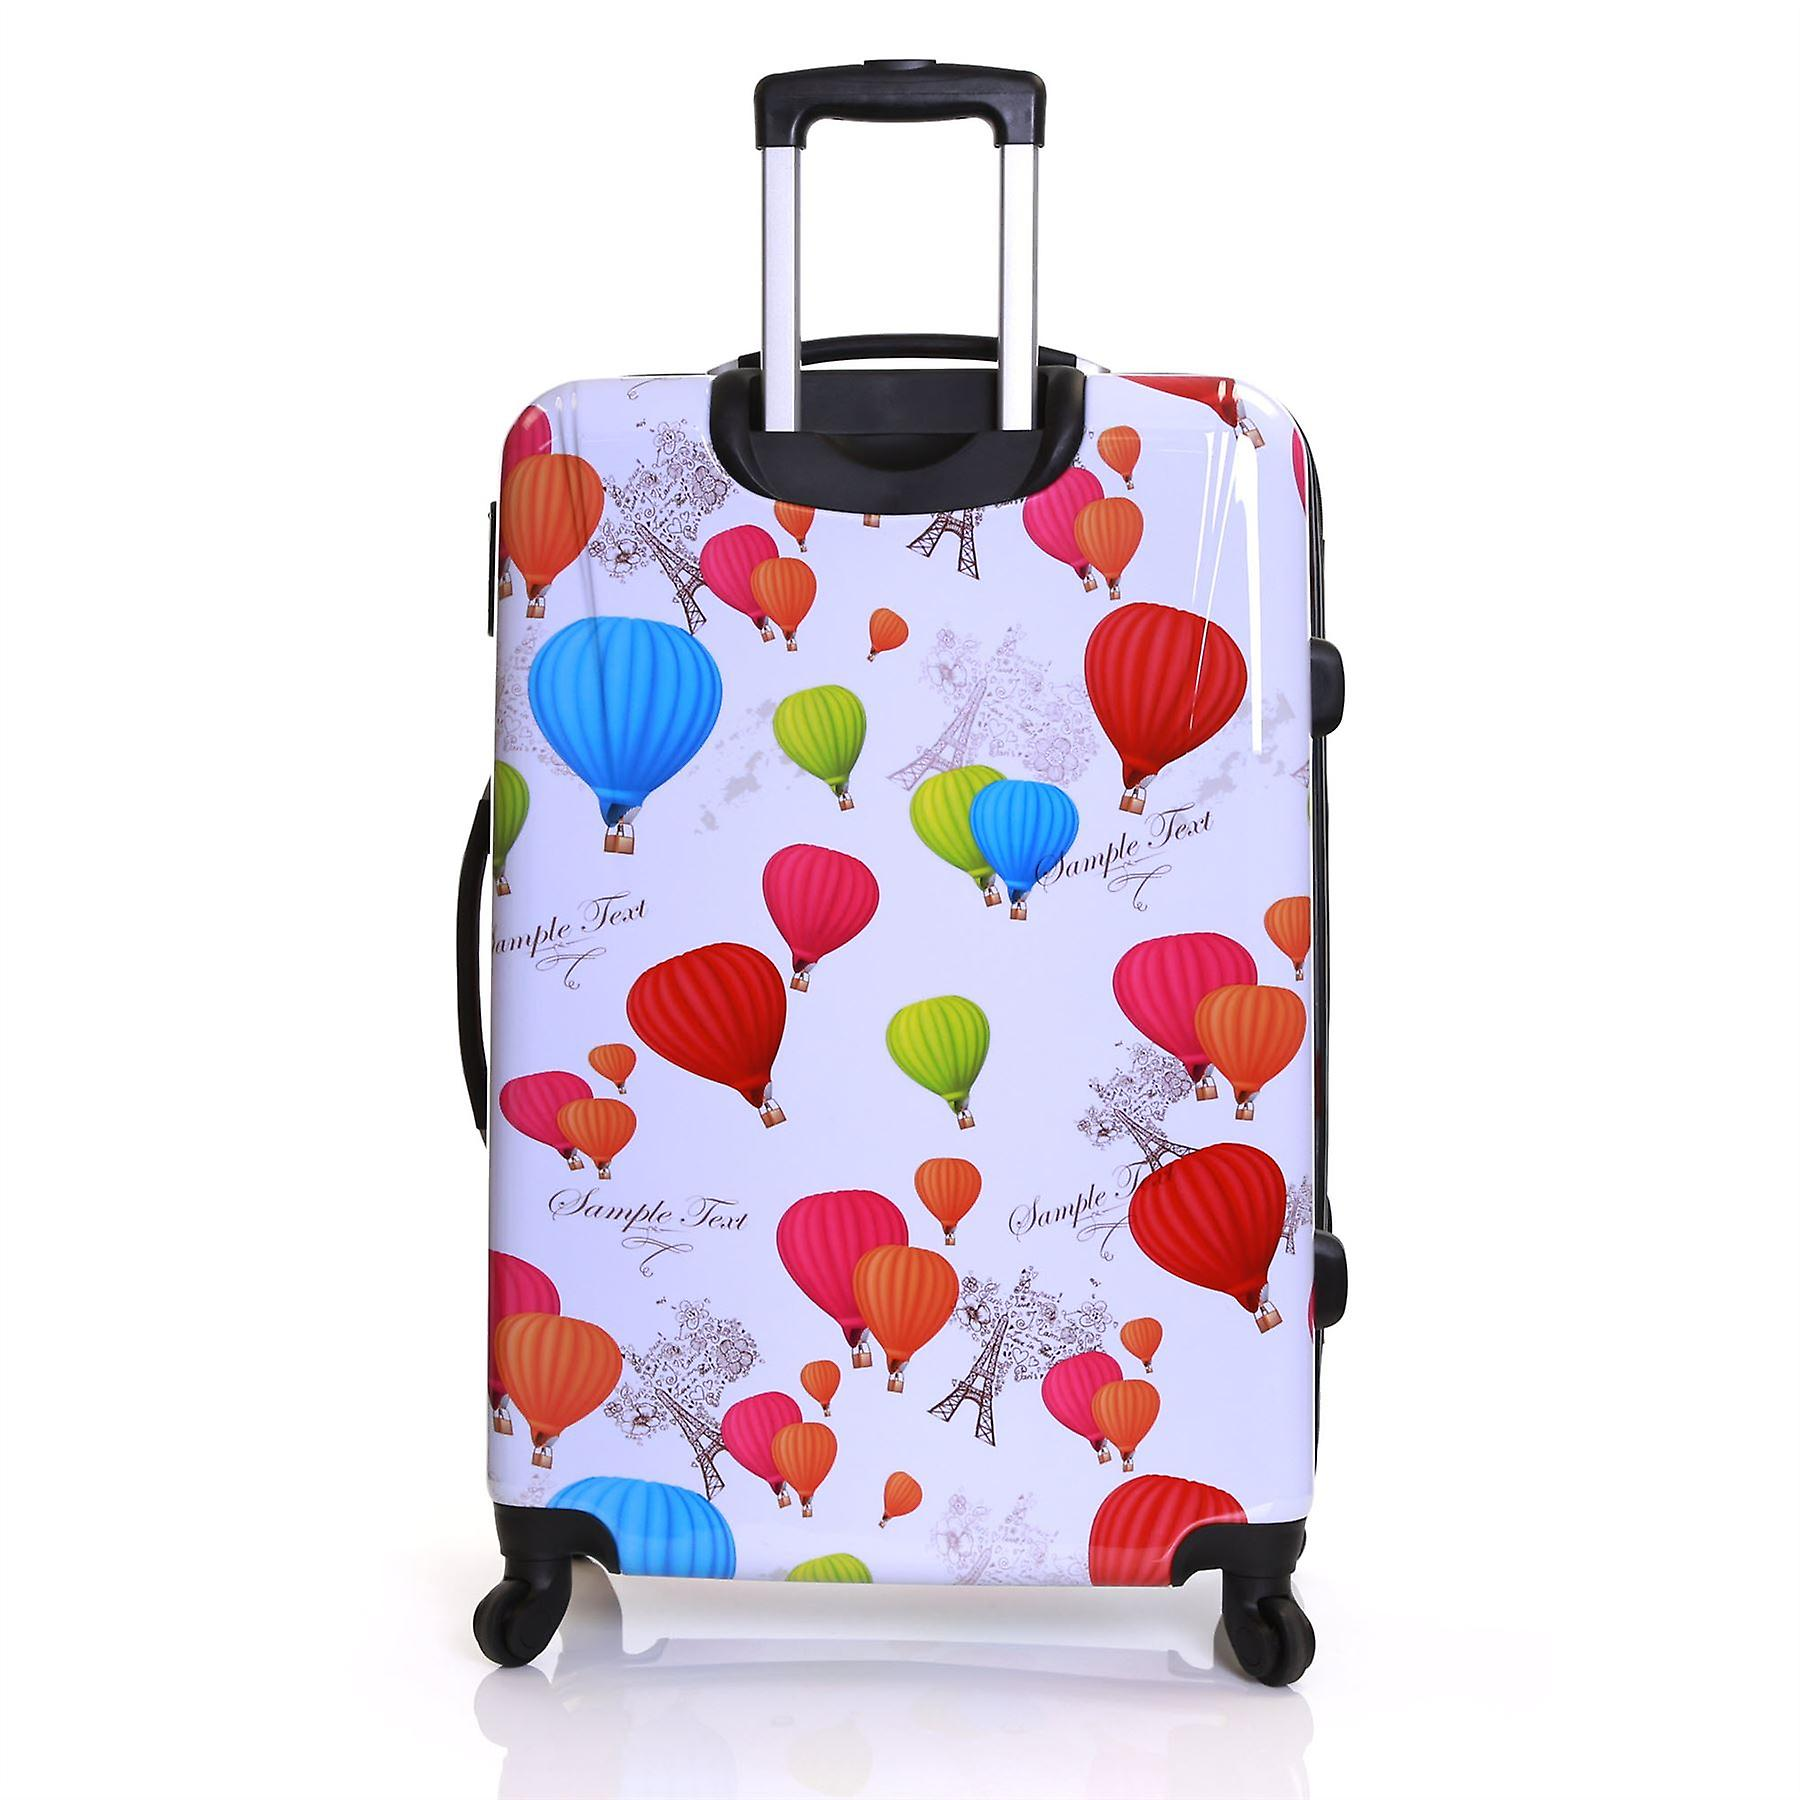 Karabar Dewberry 76 cm Hard Suitcase, Balloons